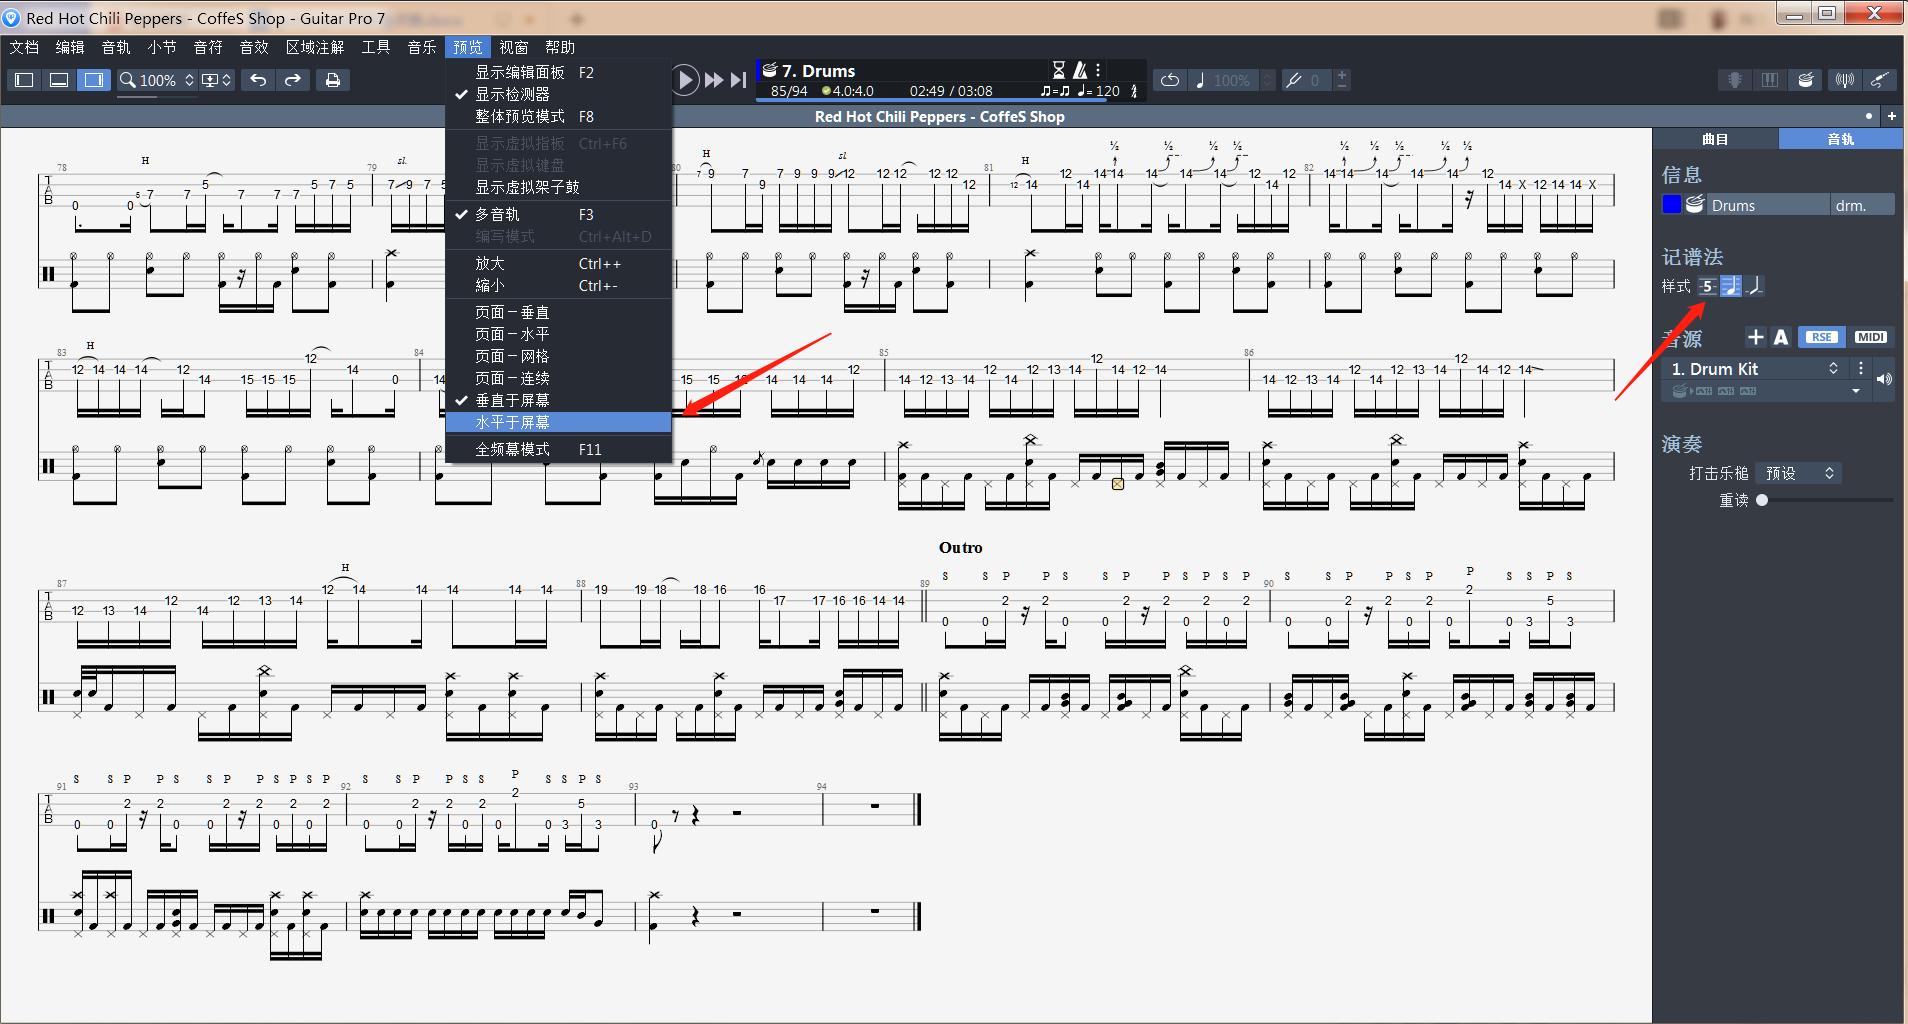 Guitar Pro改變譜面顯示示意圖